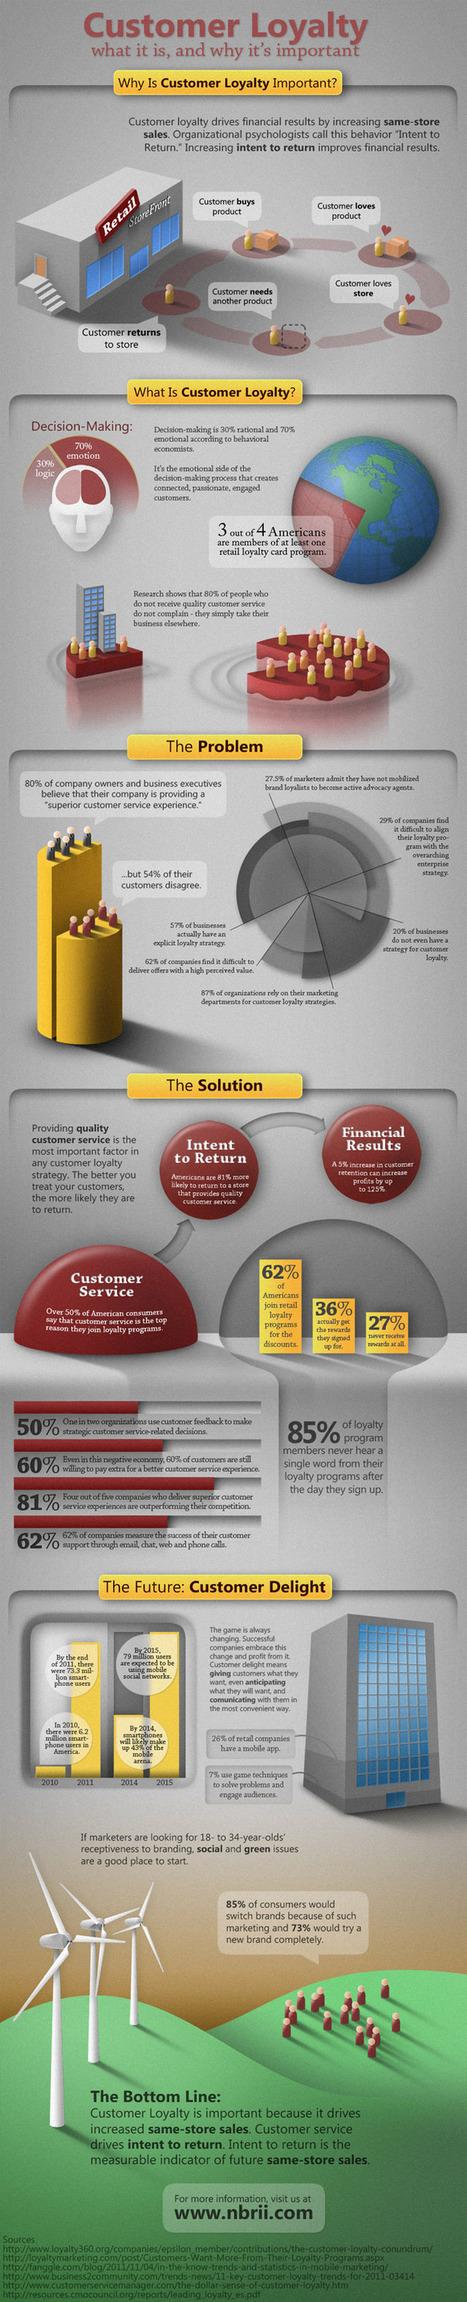 Why is customer loyalty important, NBRI | Marketing, PR & Communications | Scoop.it